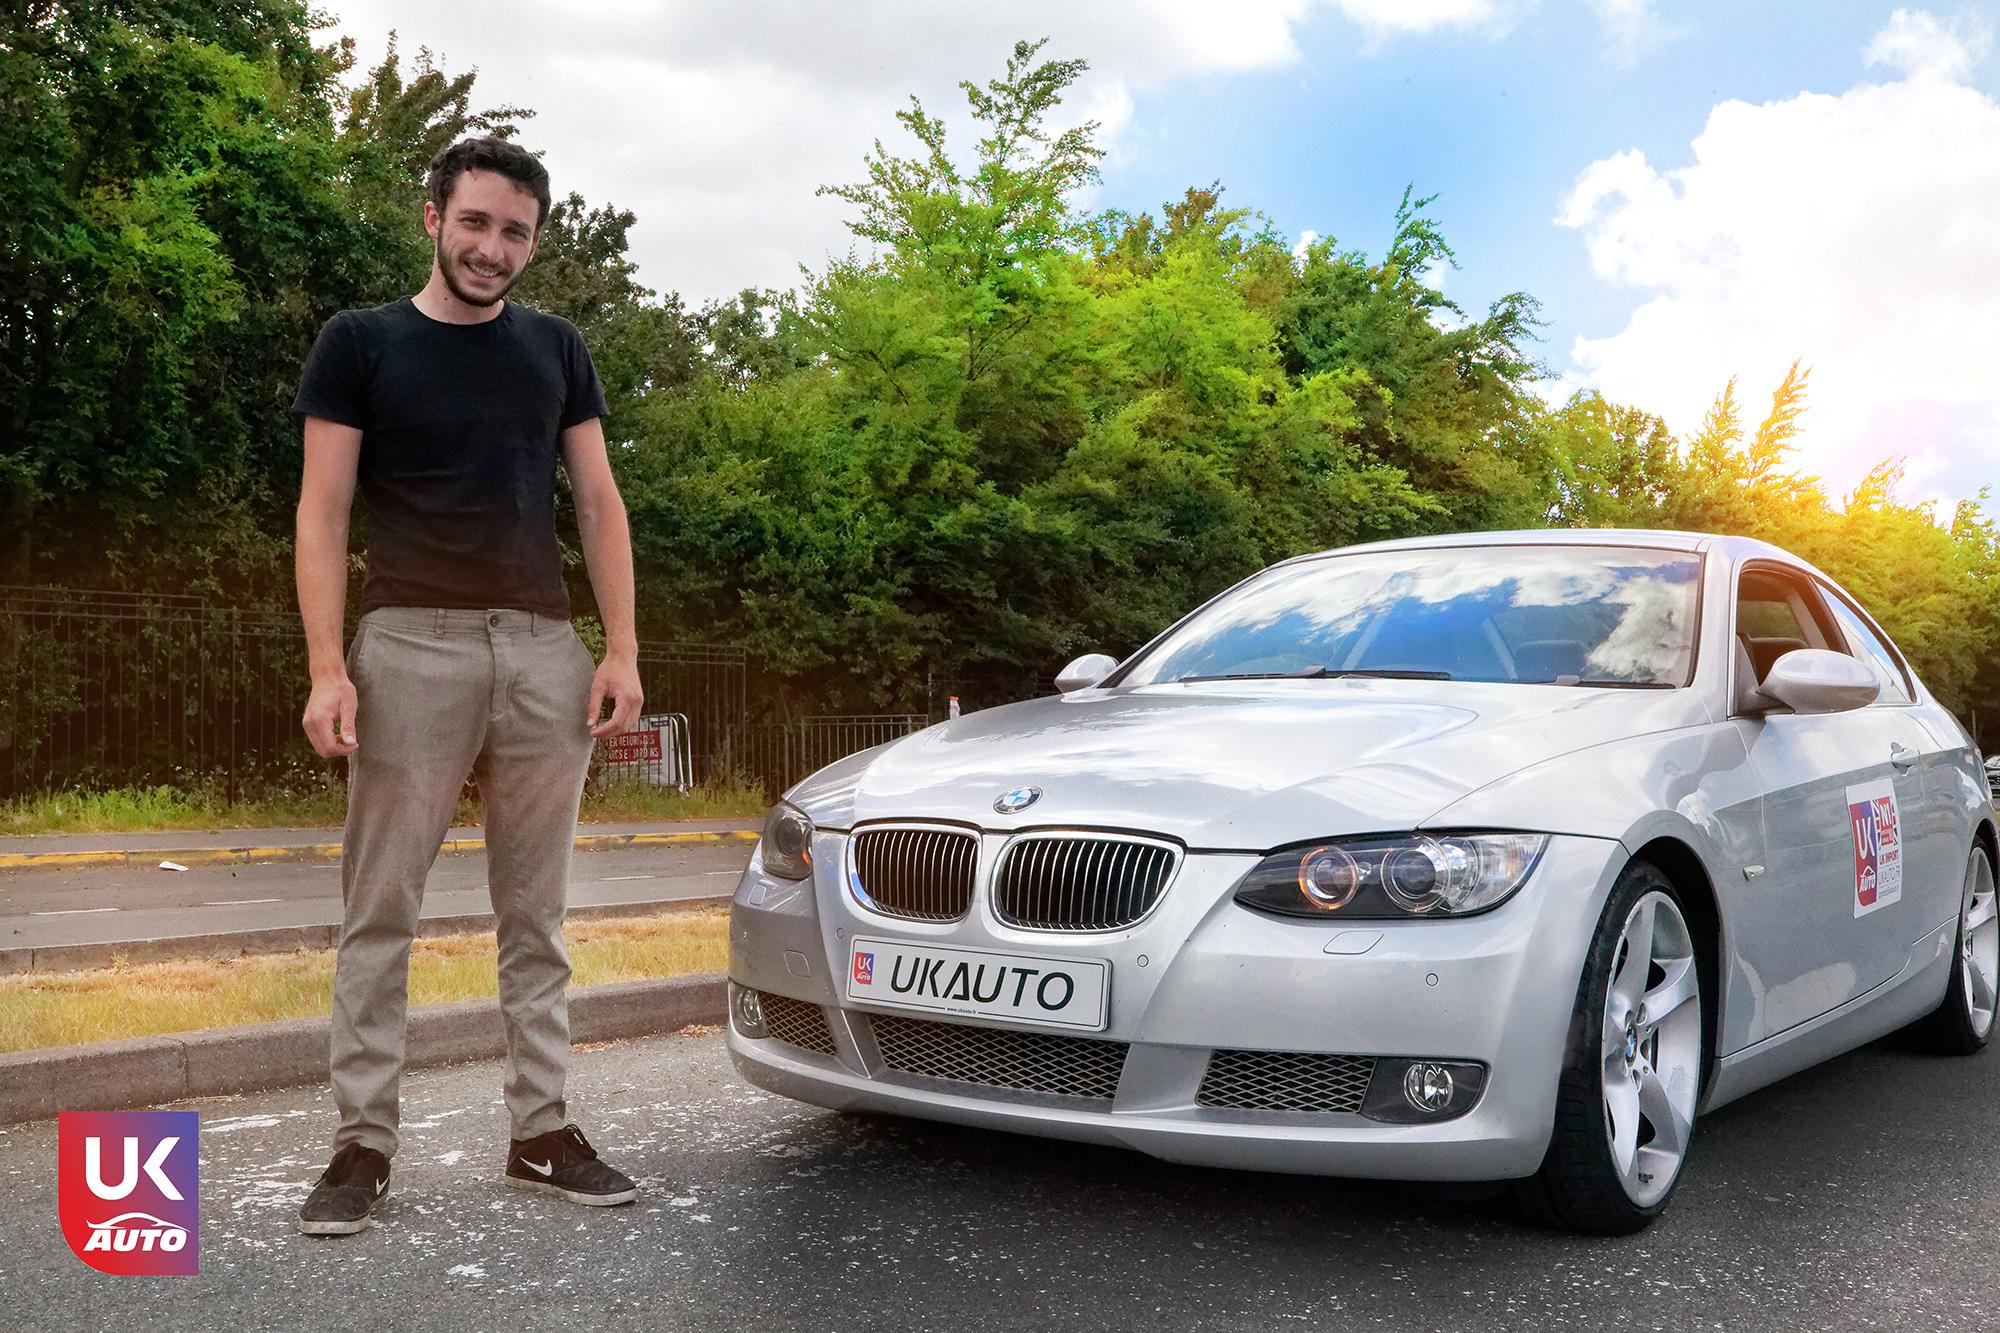 Bmw 335i rhd import uk bmw occasion bmw mandataire e92 rhd coupe uk auto uk ukauto13 - Felecitation a Julien pour cette BMW 335i E92 COUPE RHD importateur voitures anglaises